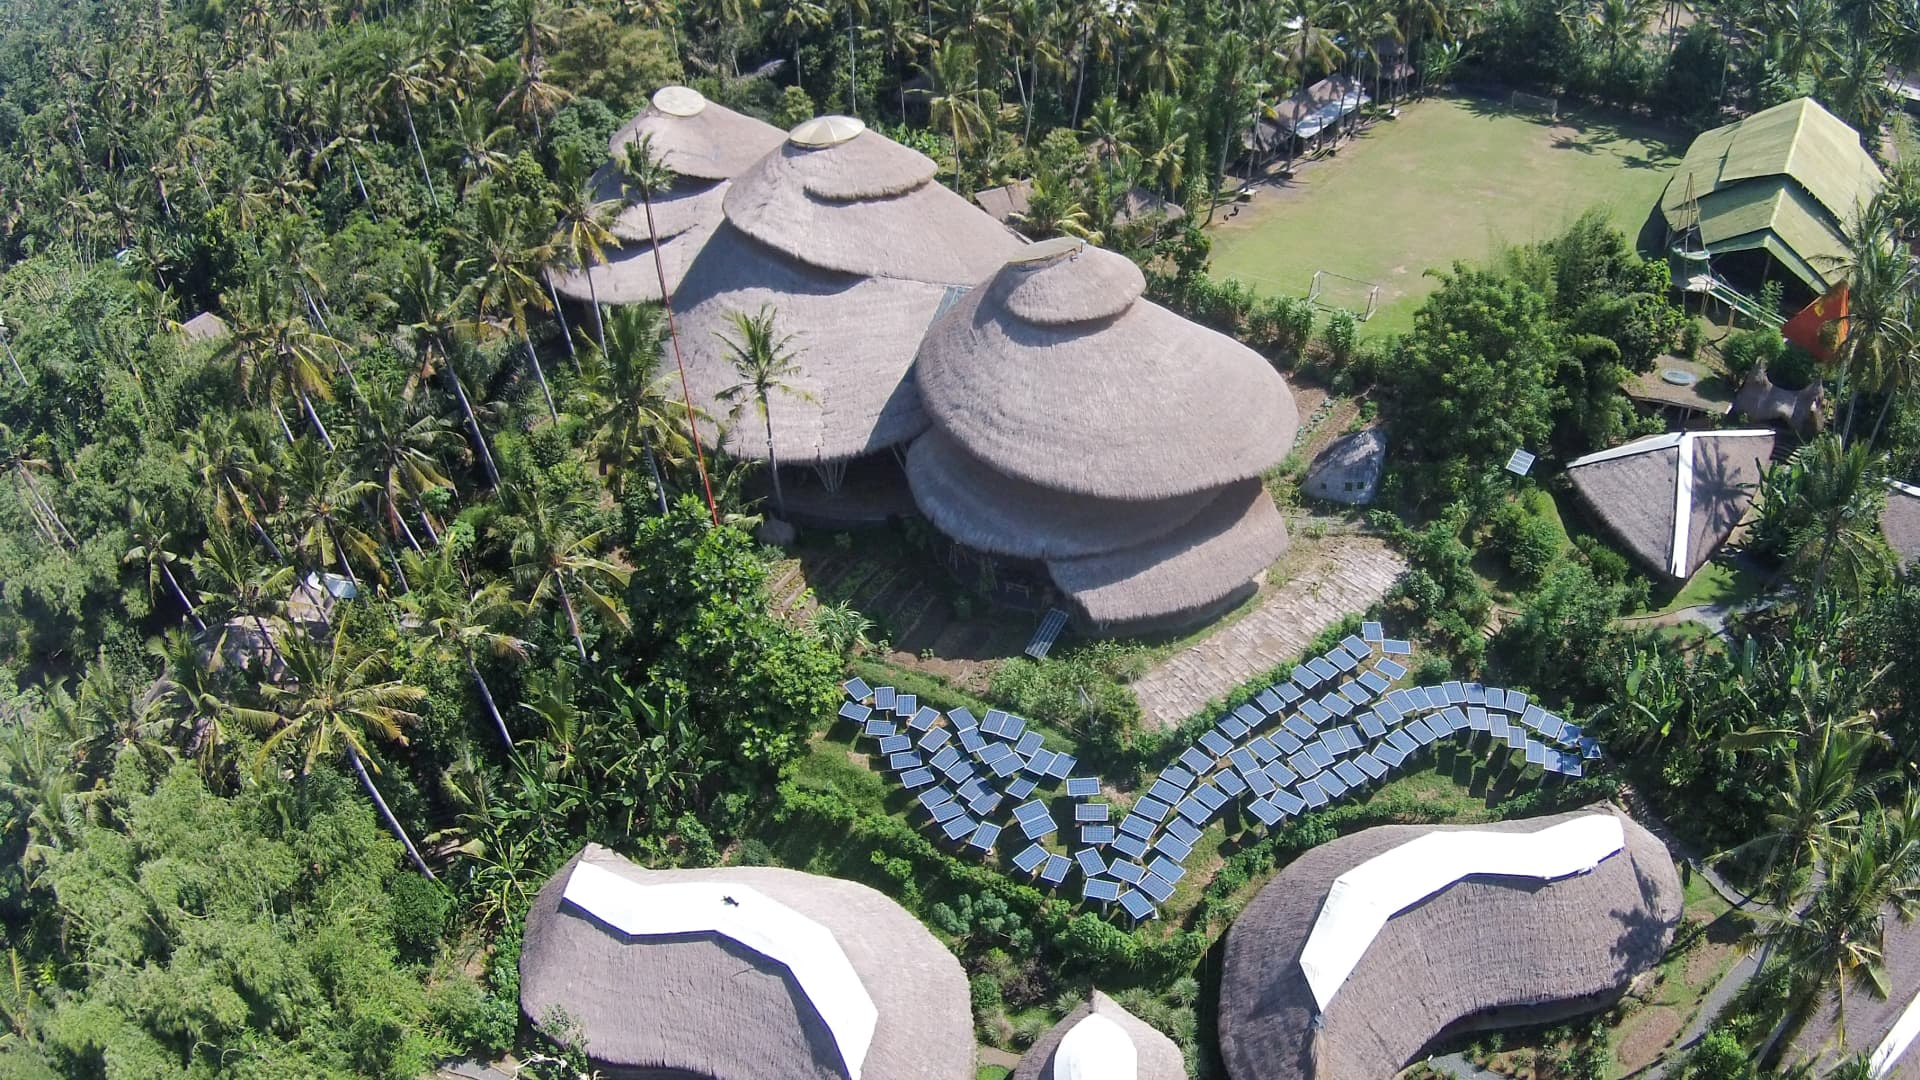 A bird's-eye view of the Green School Bali in Ubud, Indonesia.